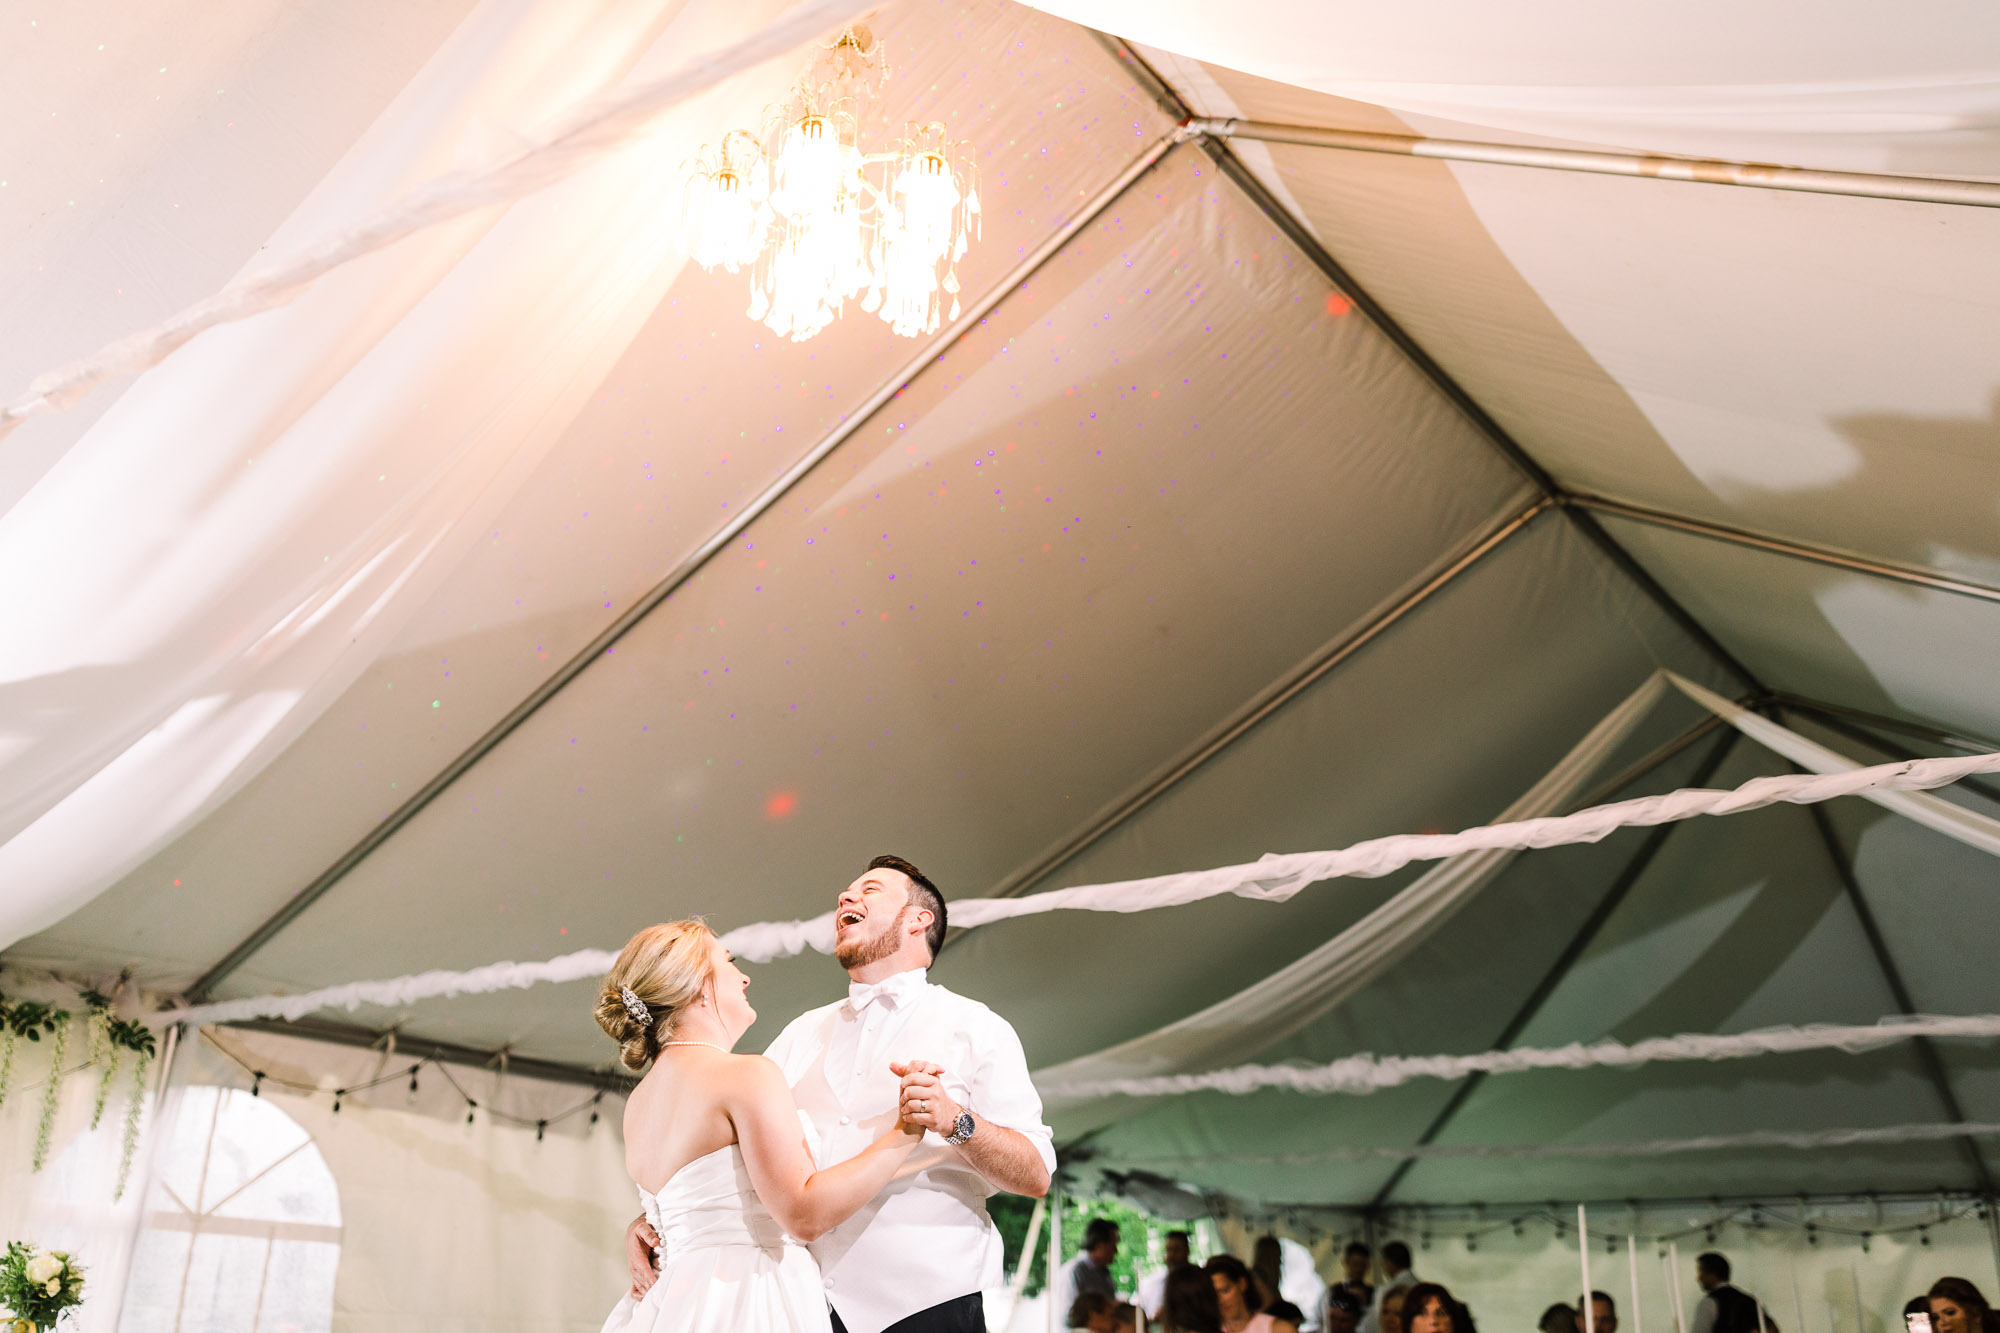 isle-of-que-wedding-7127.jpg